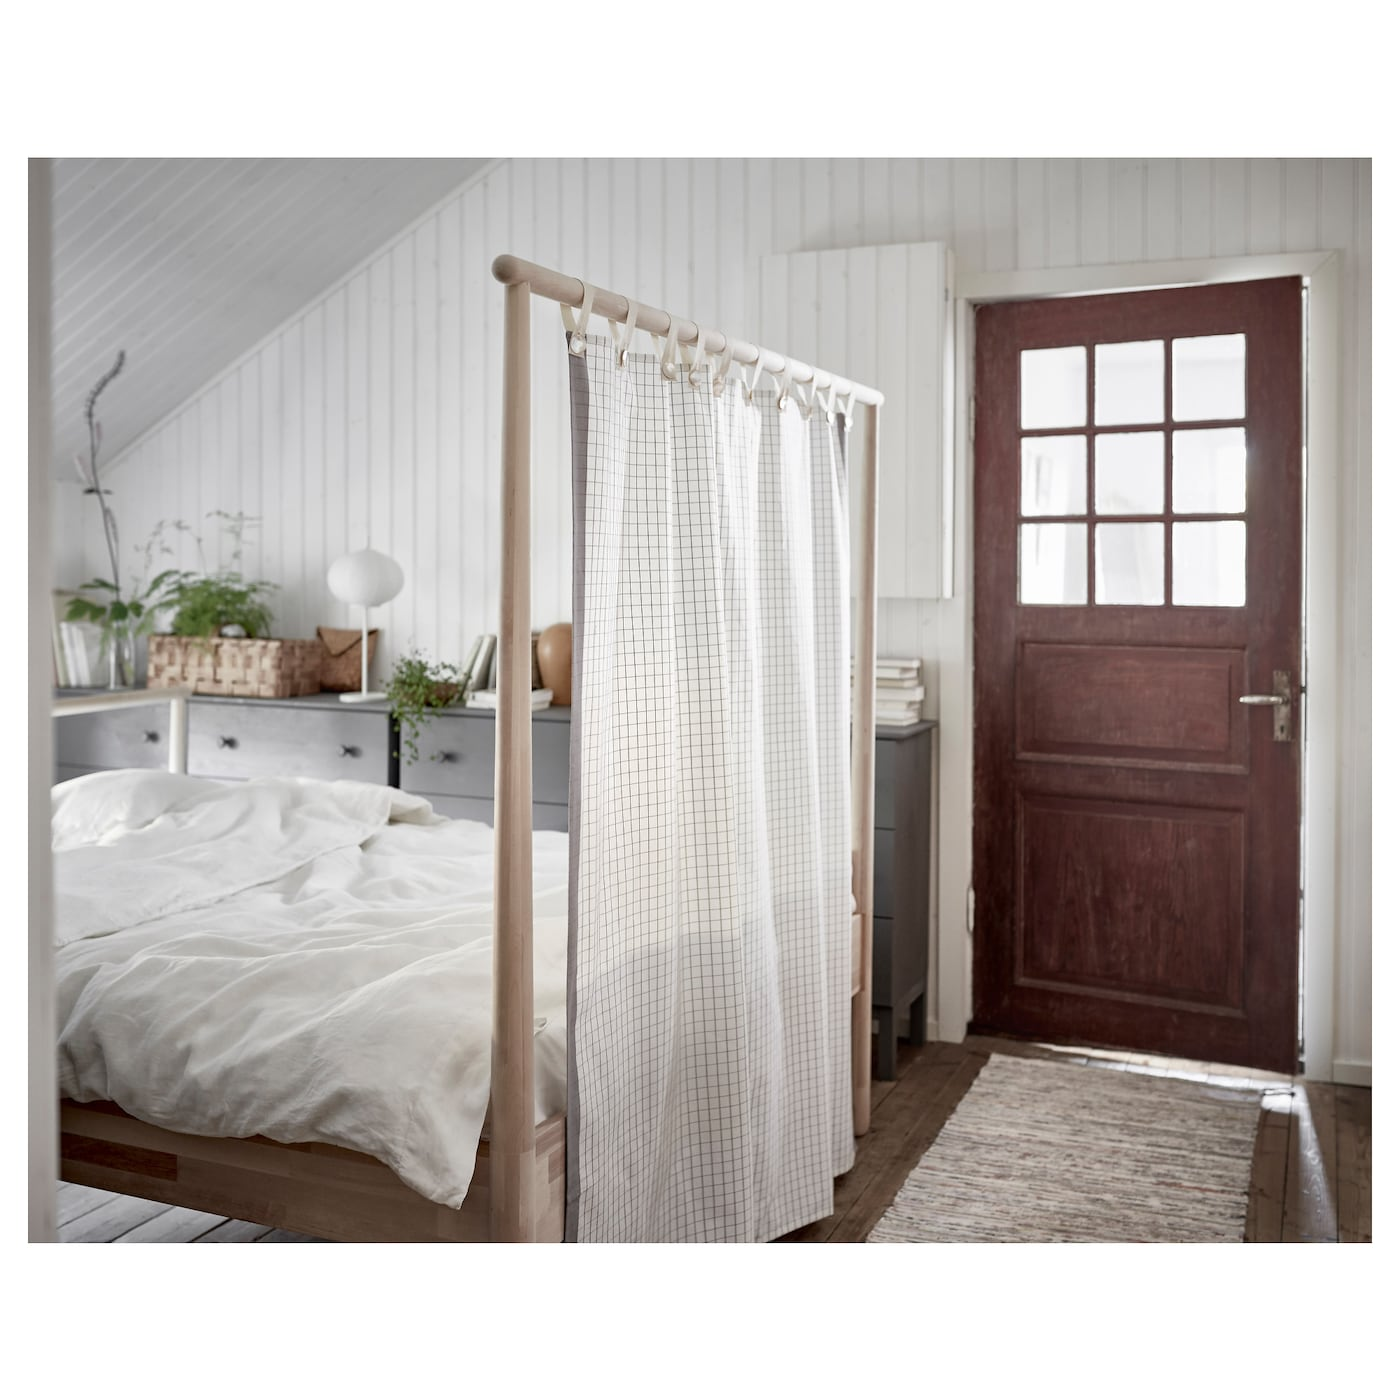 Gj ra cadre de lit bouleau 160x200 cm ikea for Clip de verre cadres photo ikea